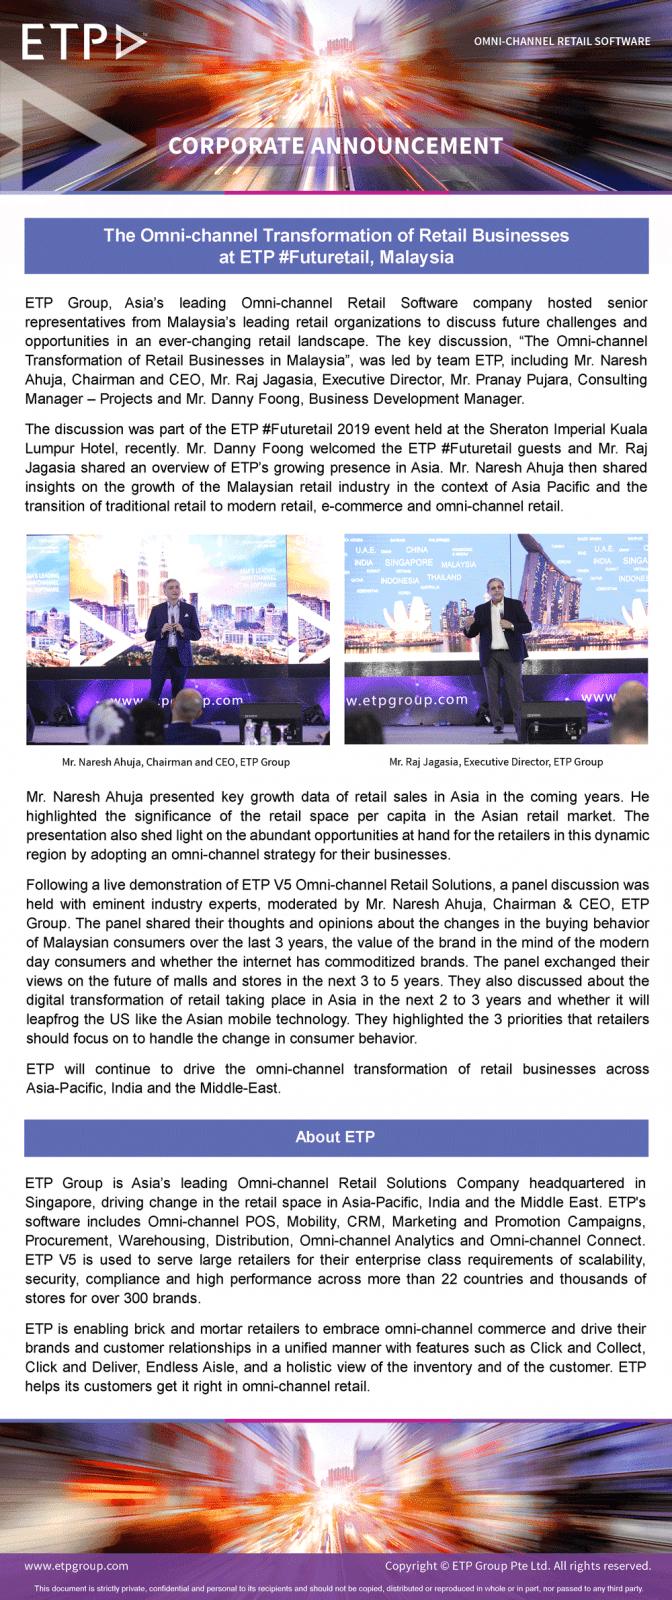 ETP Futuretail Malaysia